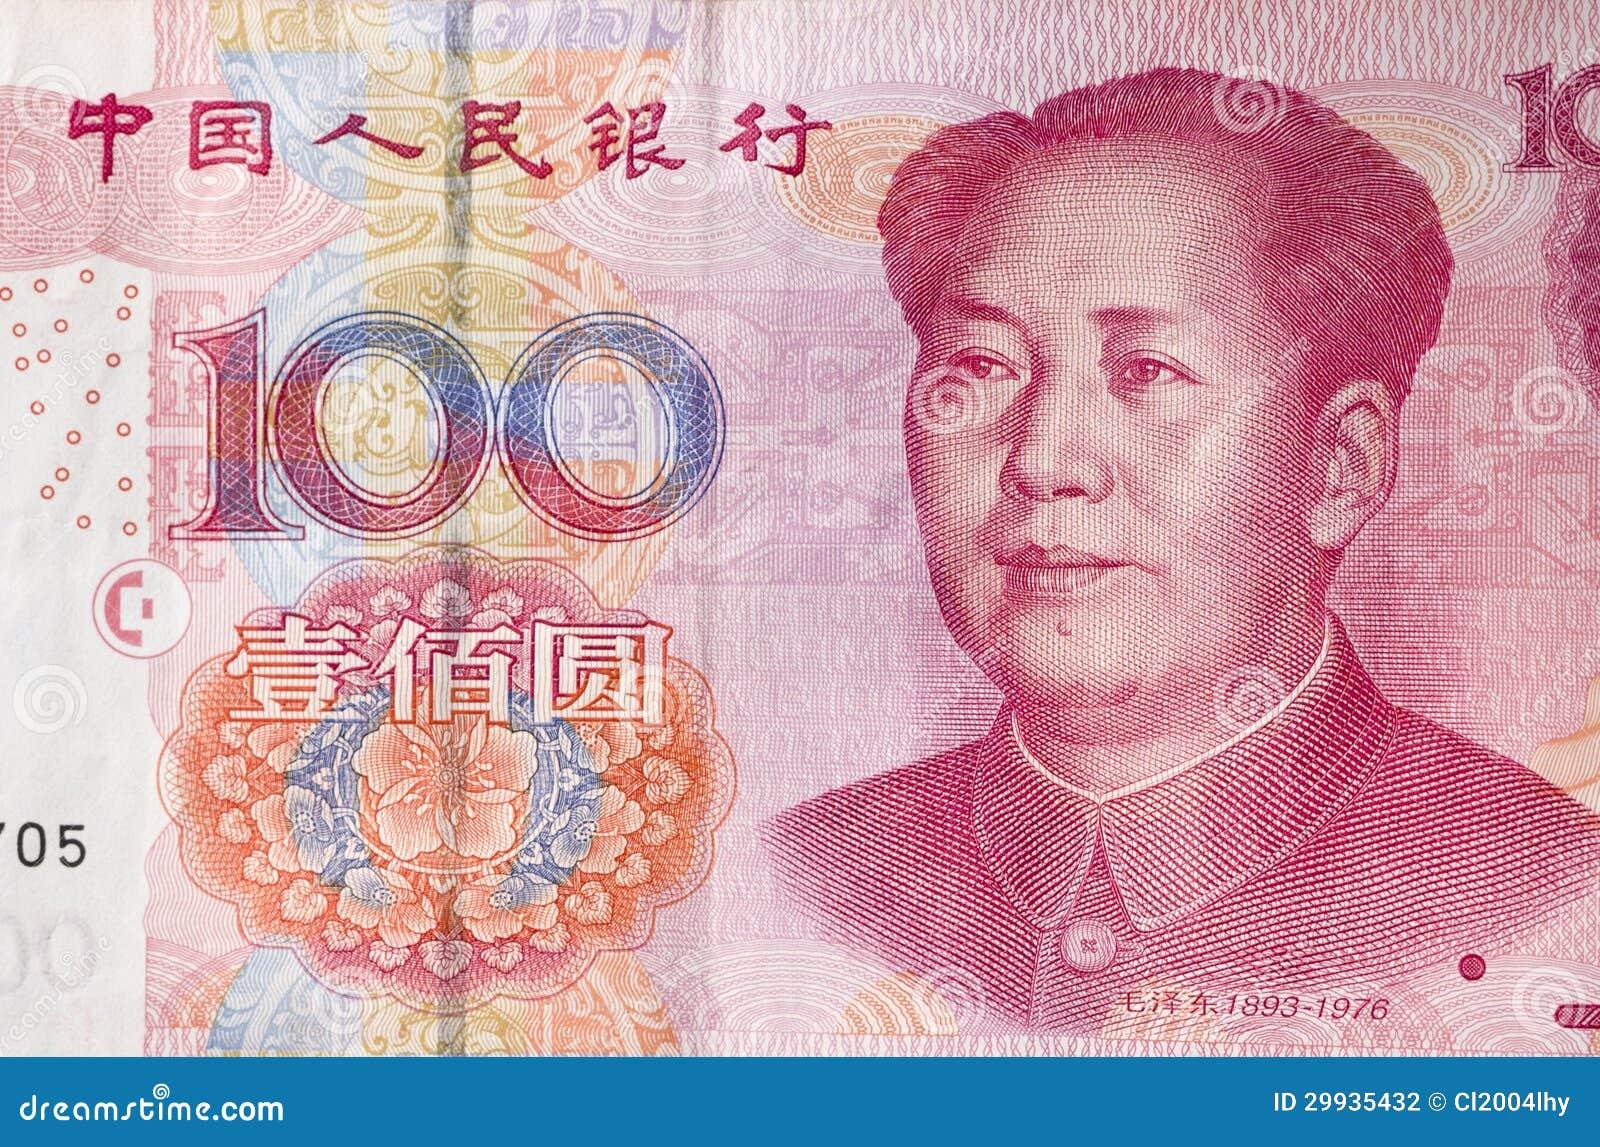 Renminbi , 100 hundred dollar.